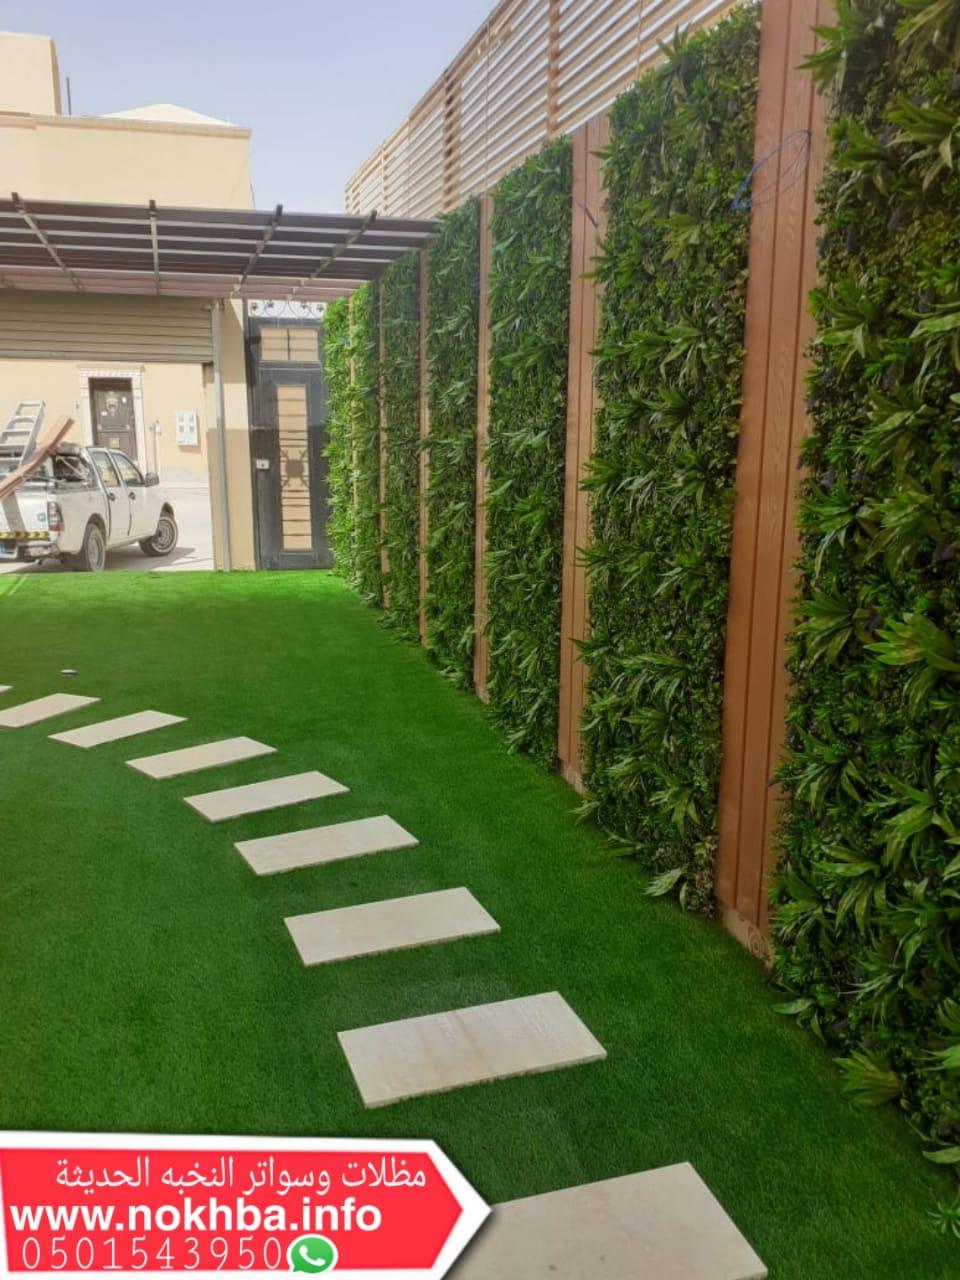 تنسيق حدائق جده , تنسيق حدائق الطائف , 0501543950 , اعشاب صناعيه , تركيب عشب صناعي , P_1753ywizd9